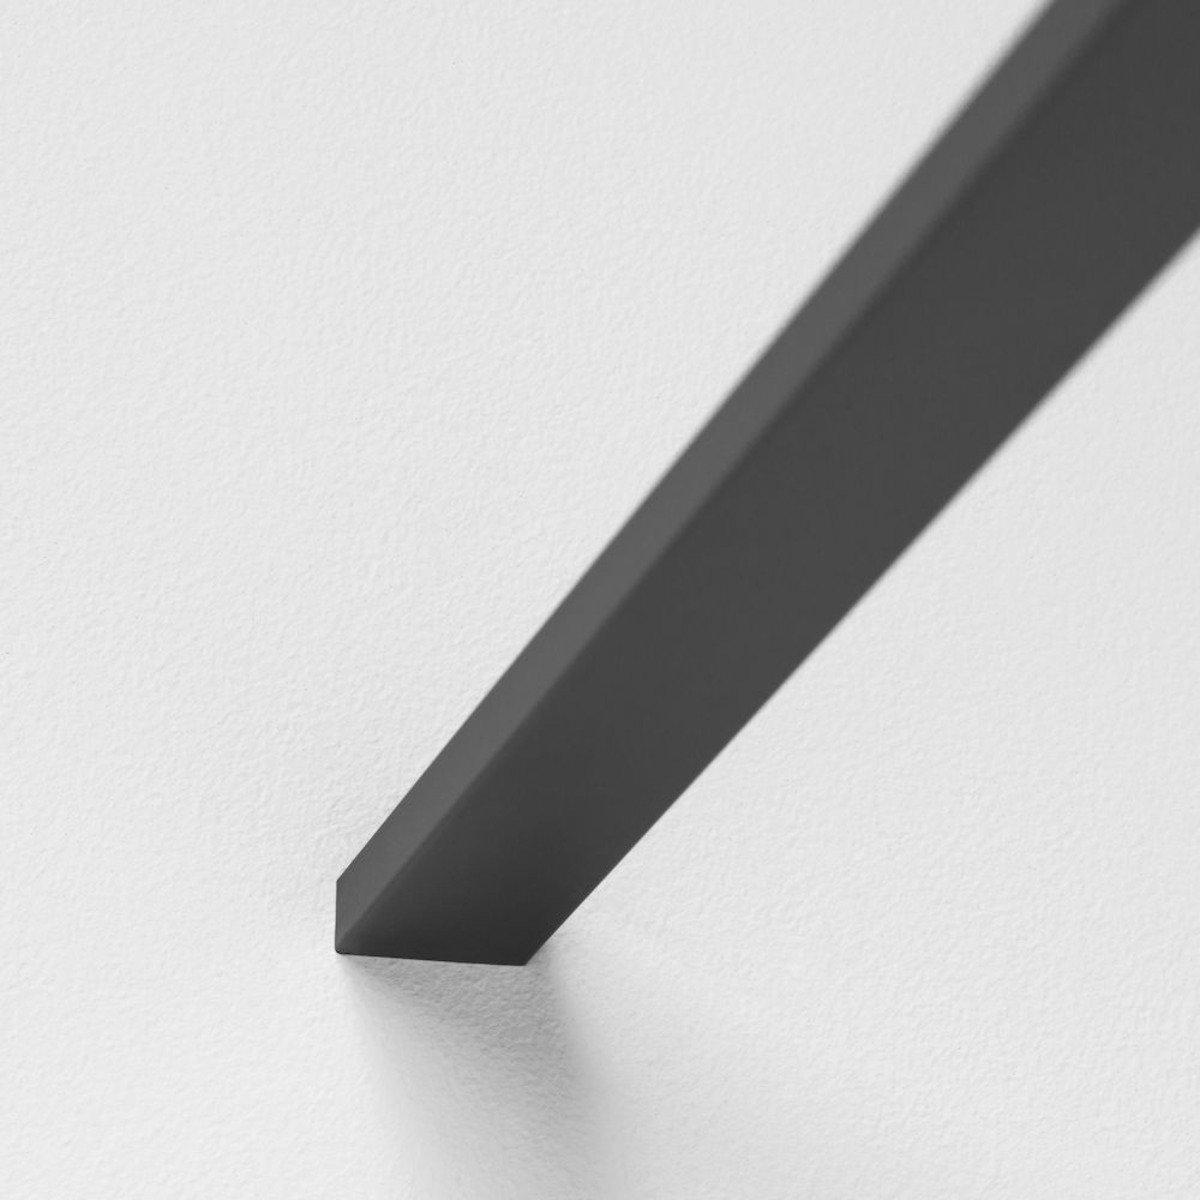 Sealskin Soho verlengde stabilisatiestang 125cm zwart